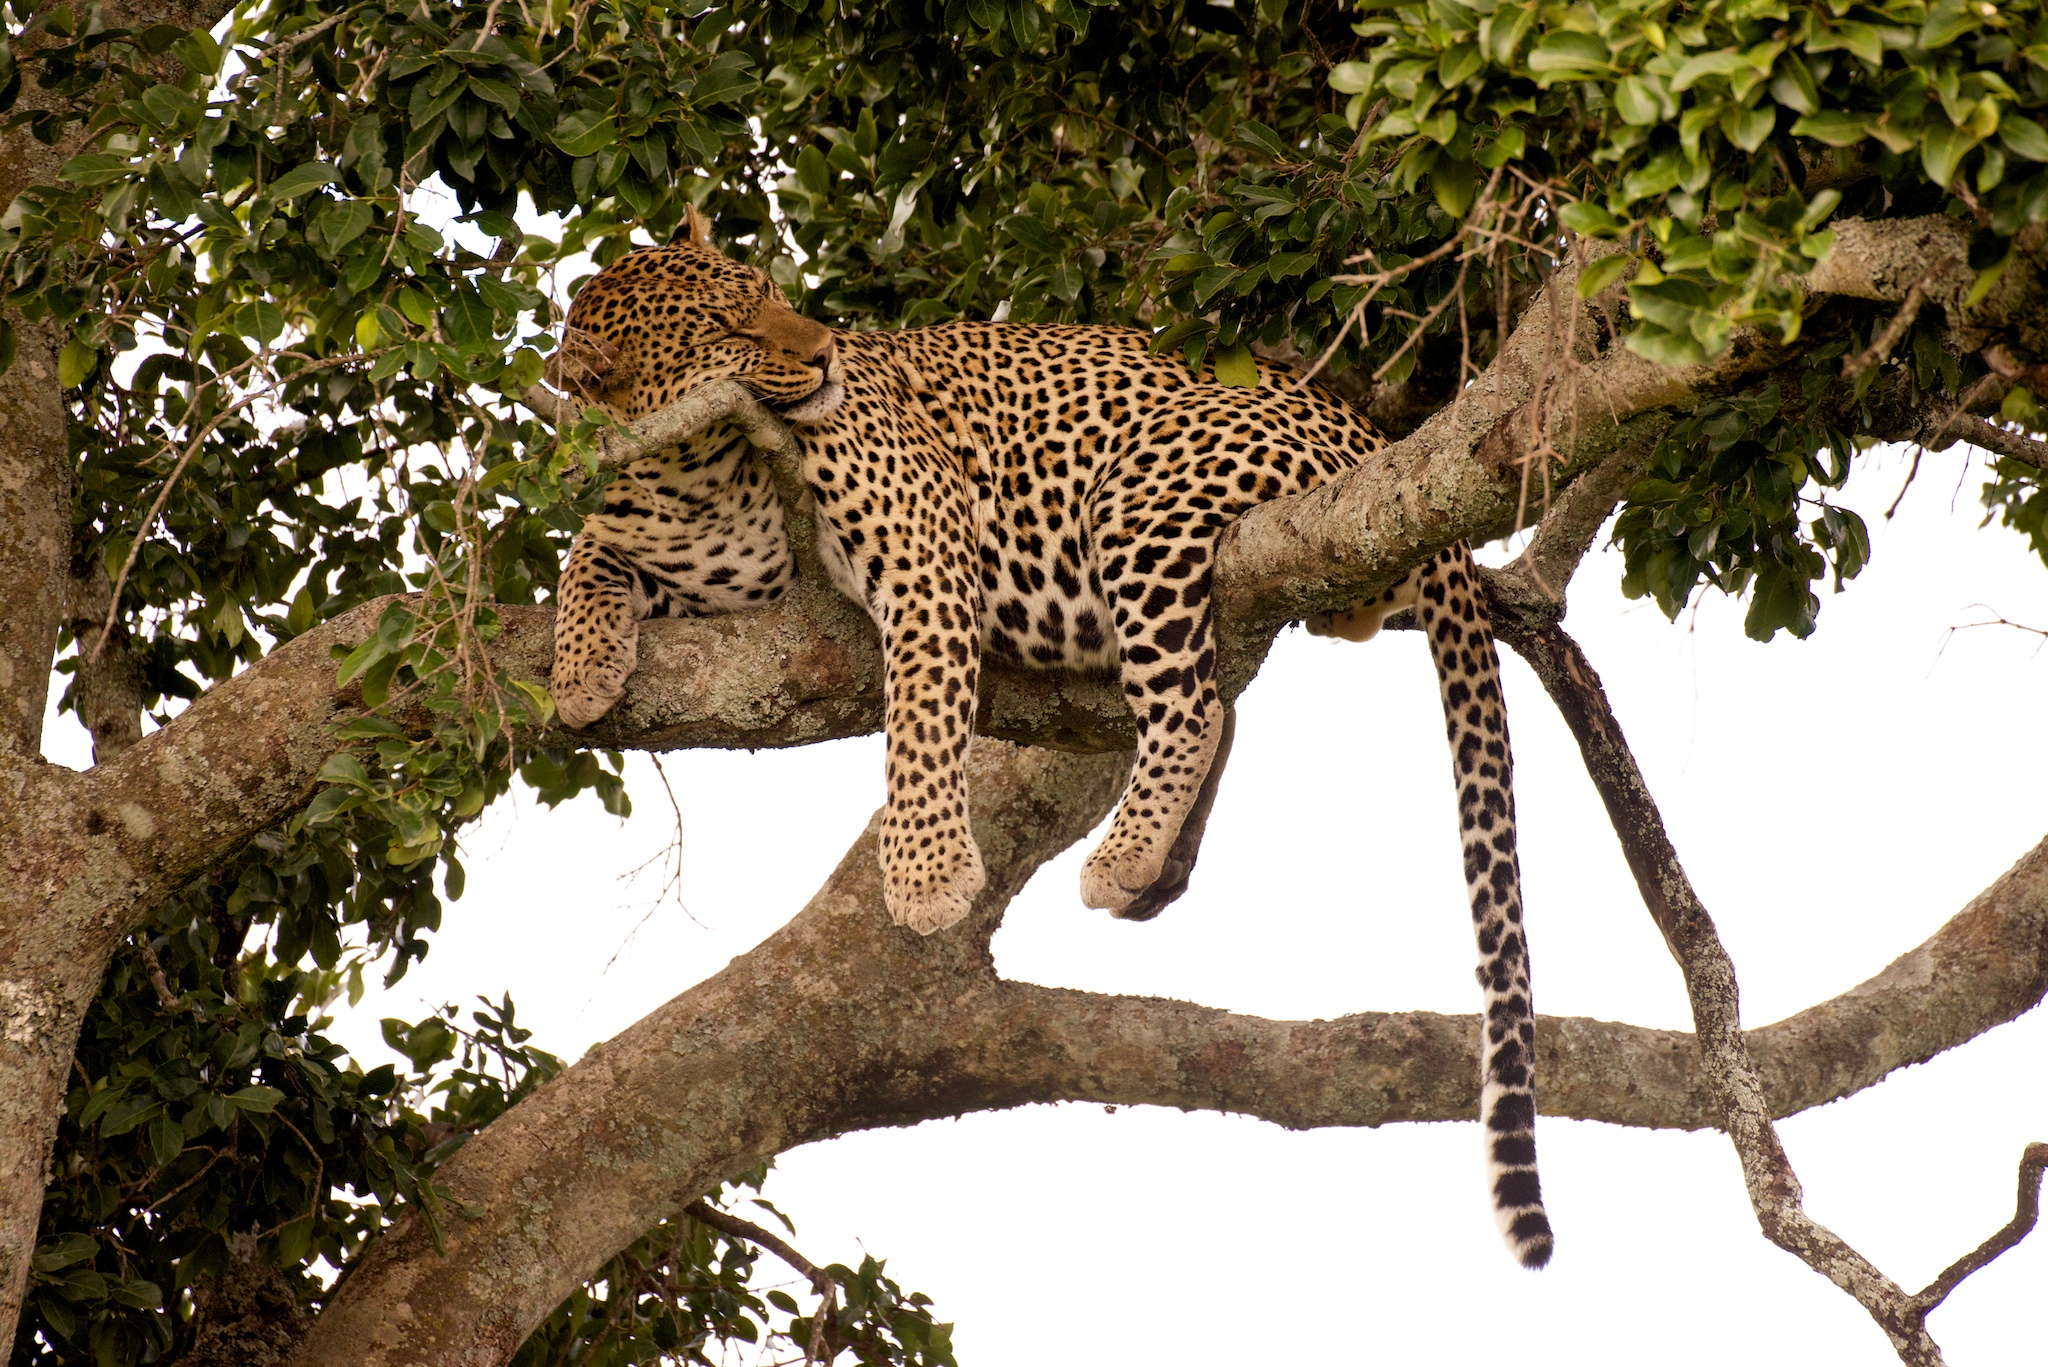 #5: Leopard